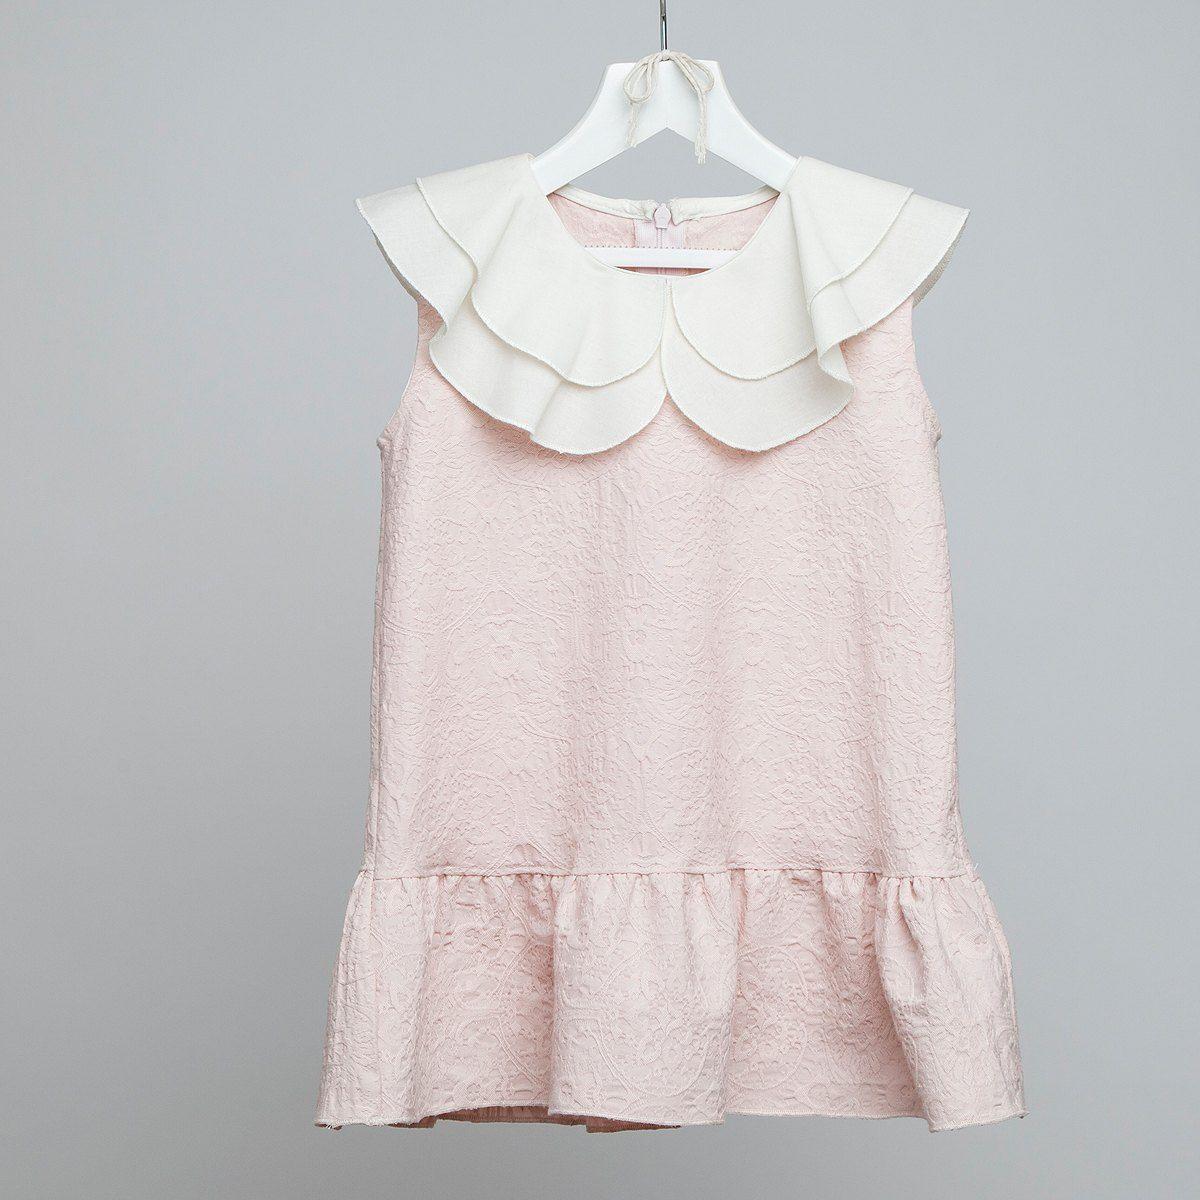 Macali sanxenxo kid fashion pinterest babies